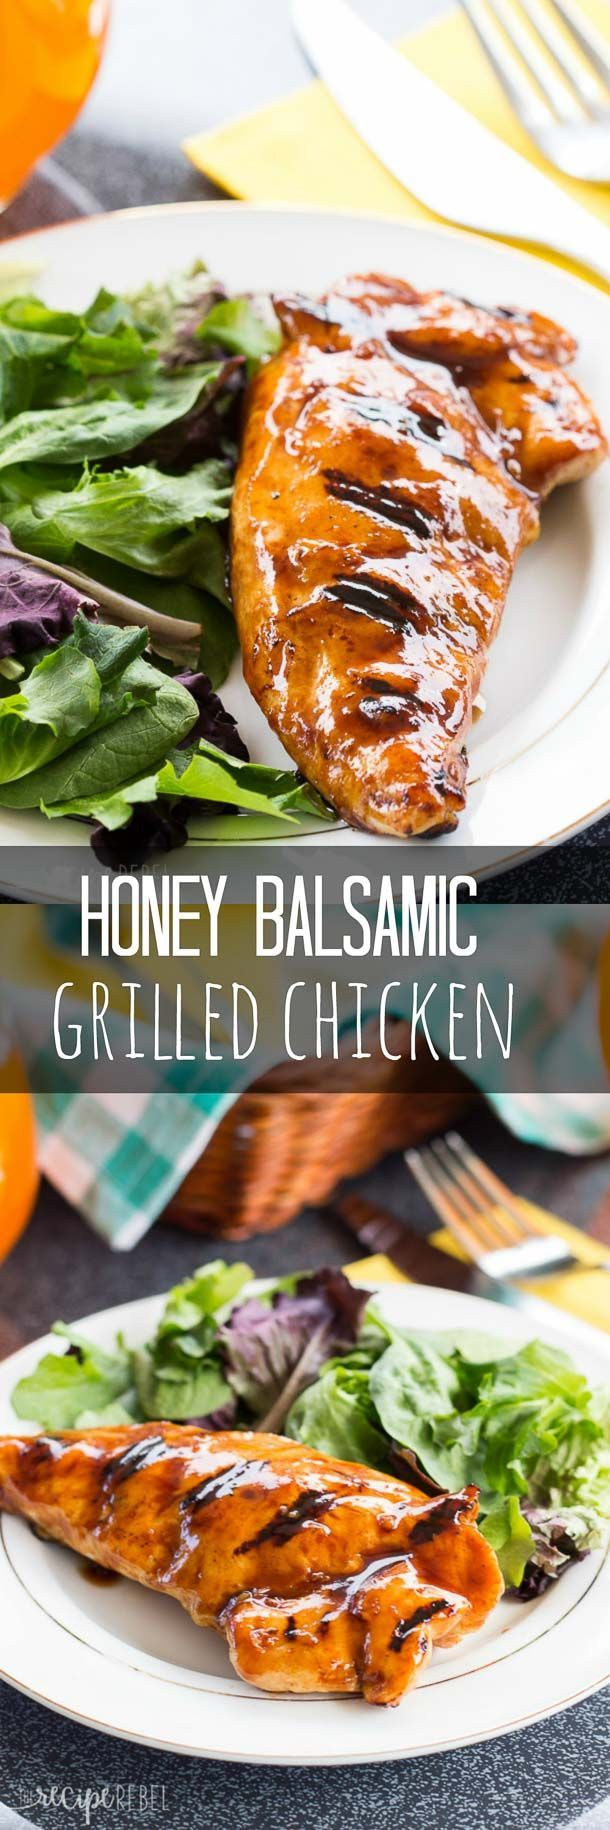 Sweet balsamic chicken recipe